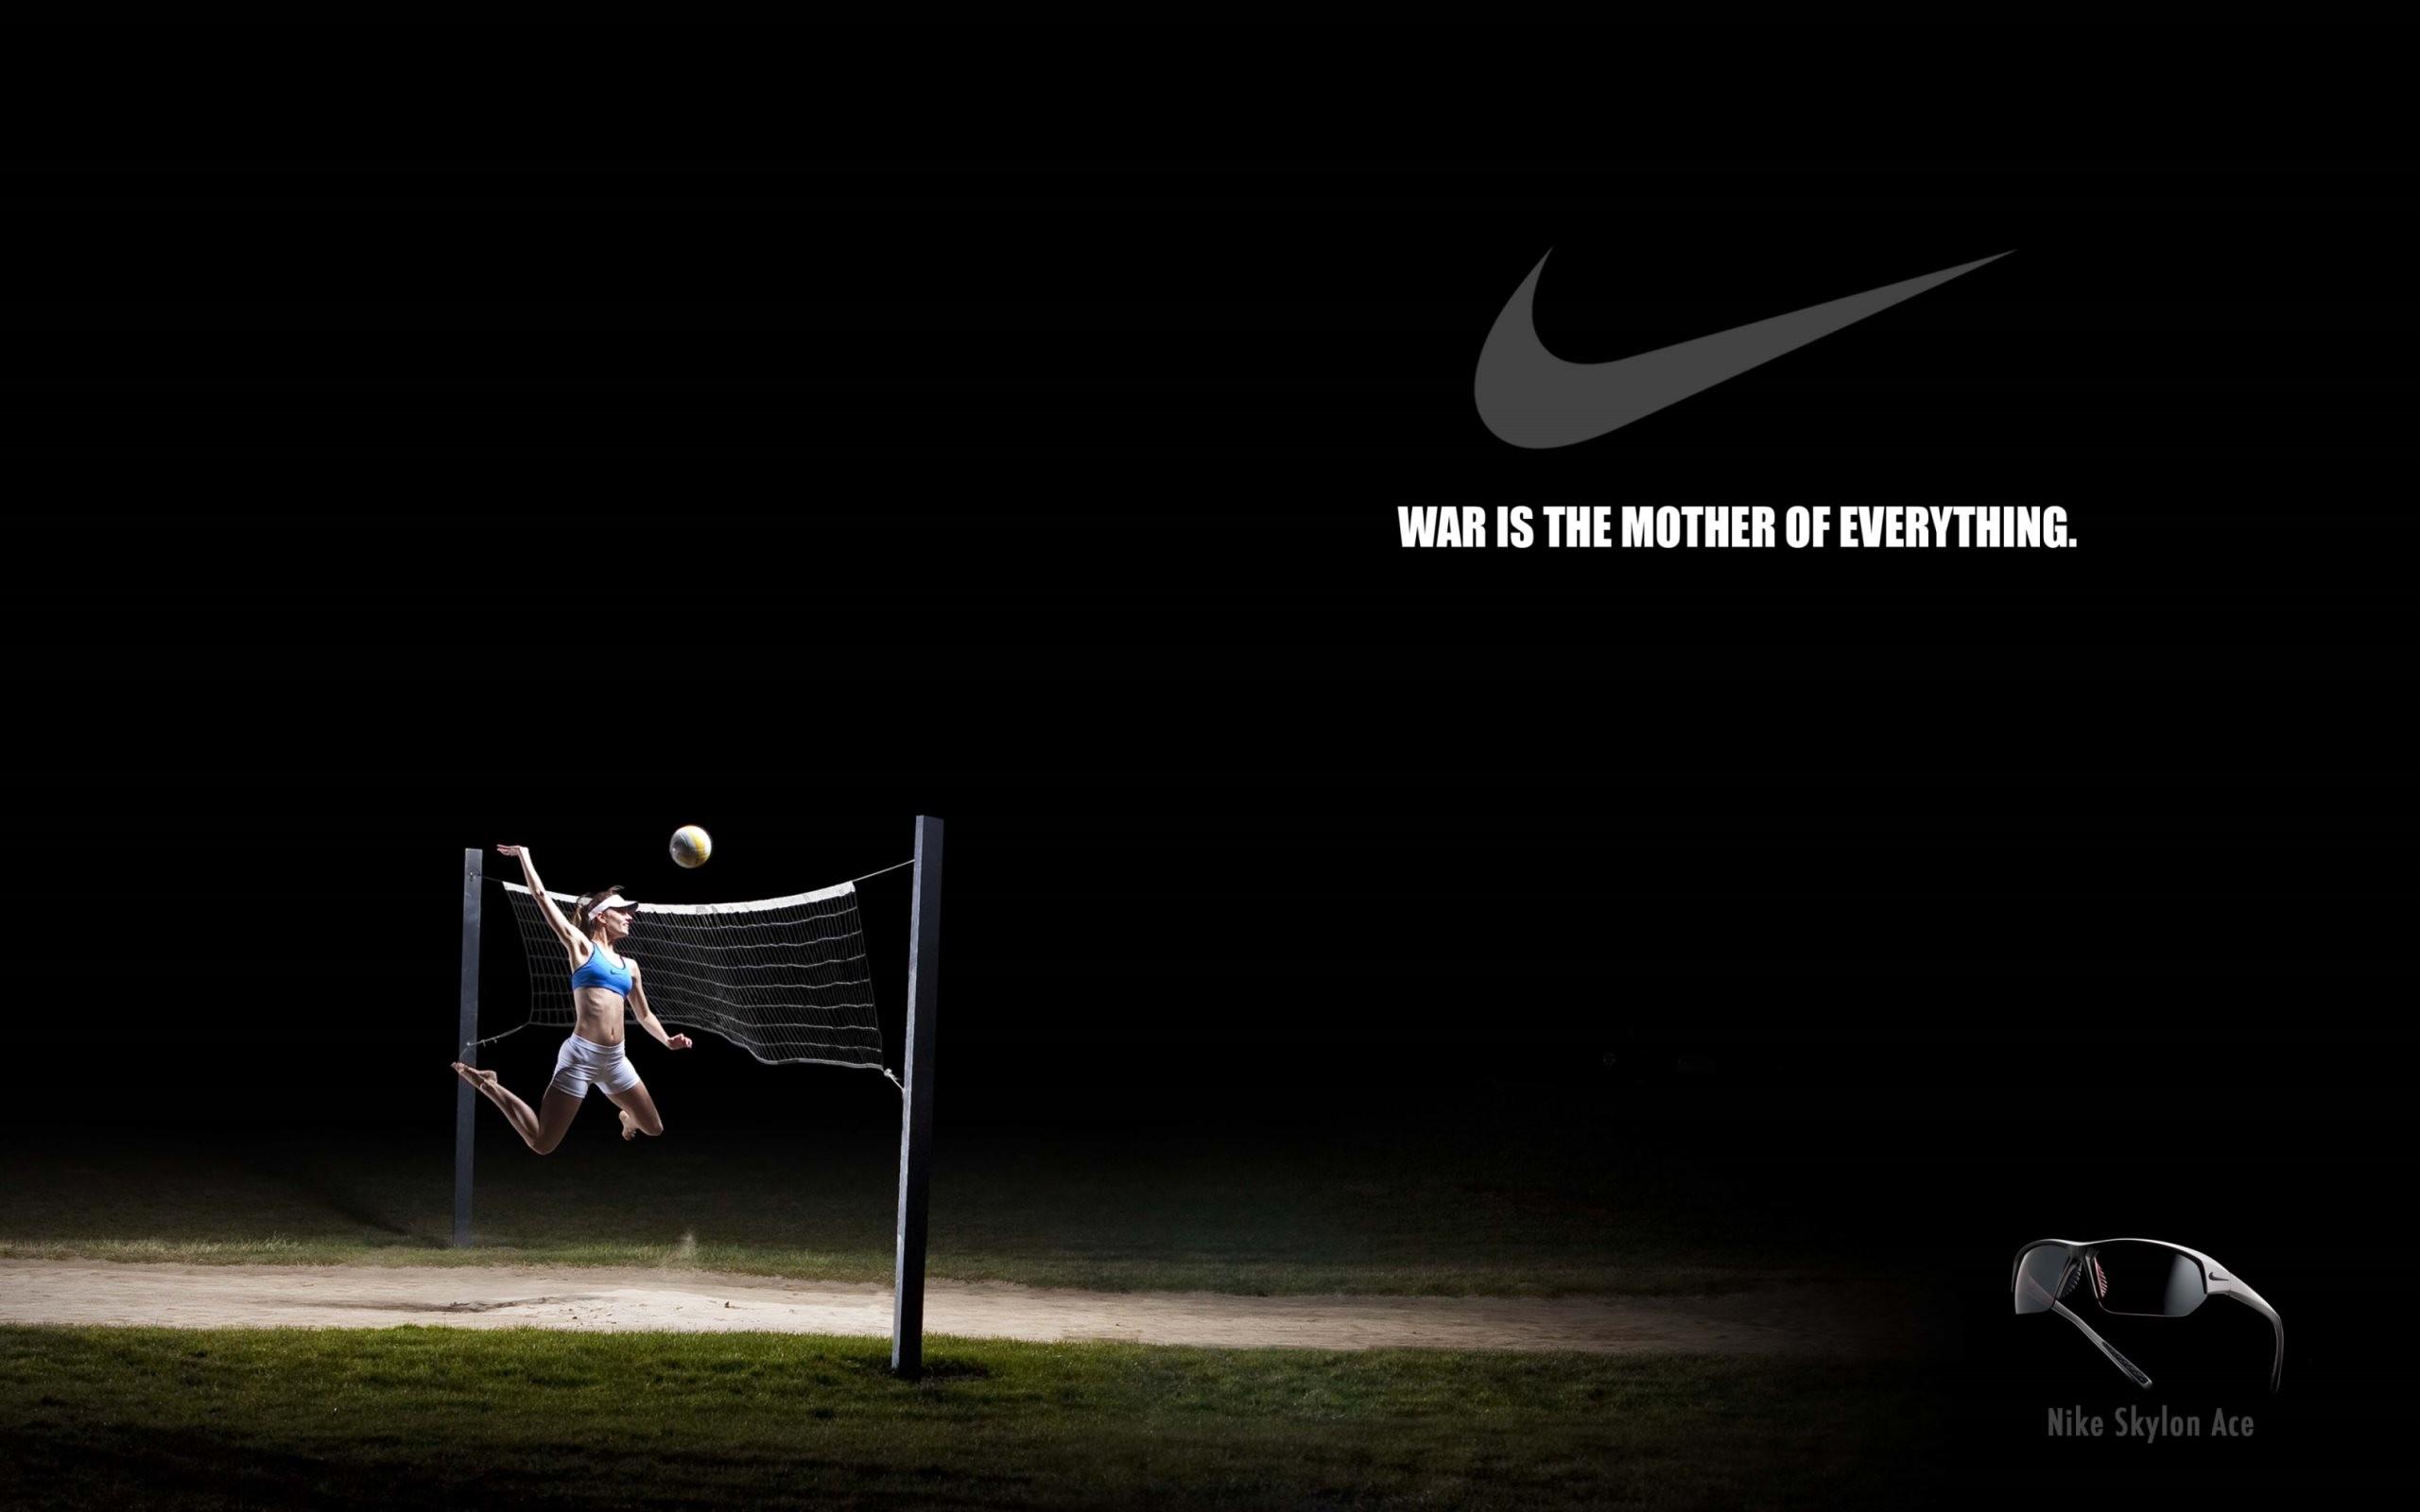 4K HD Wallpaper: Nike Creative Volleyball Poster